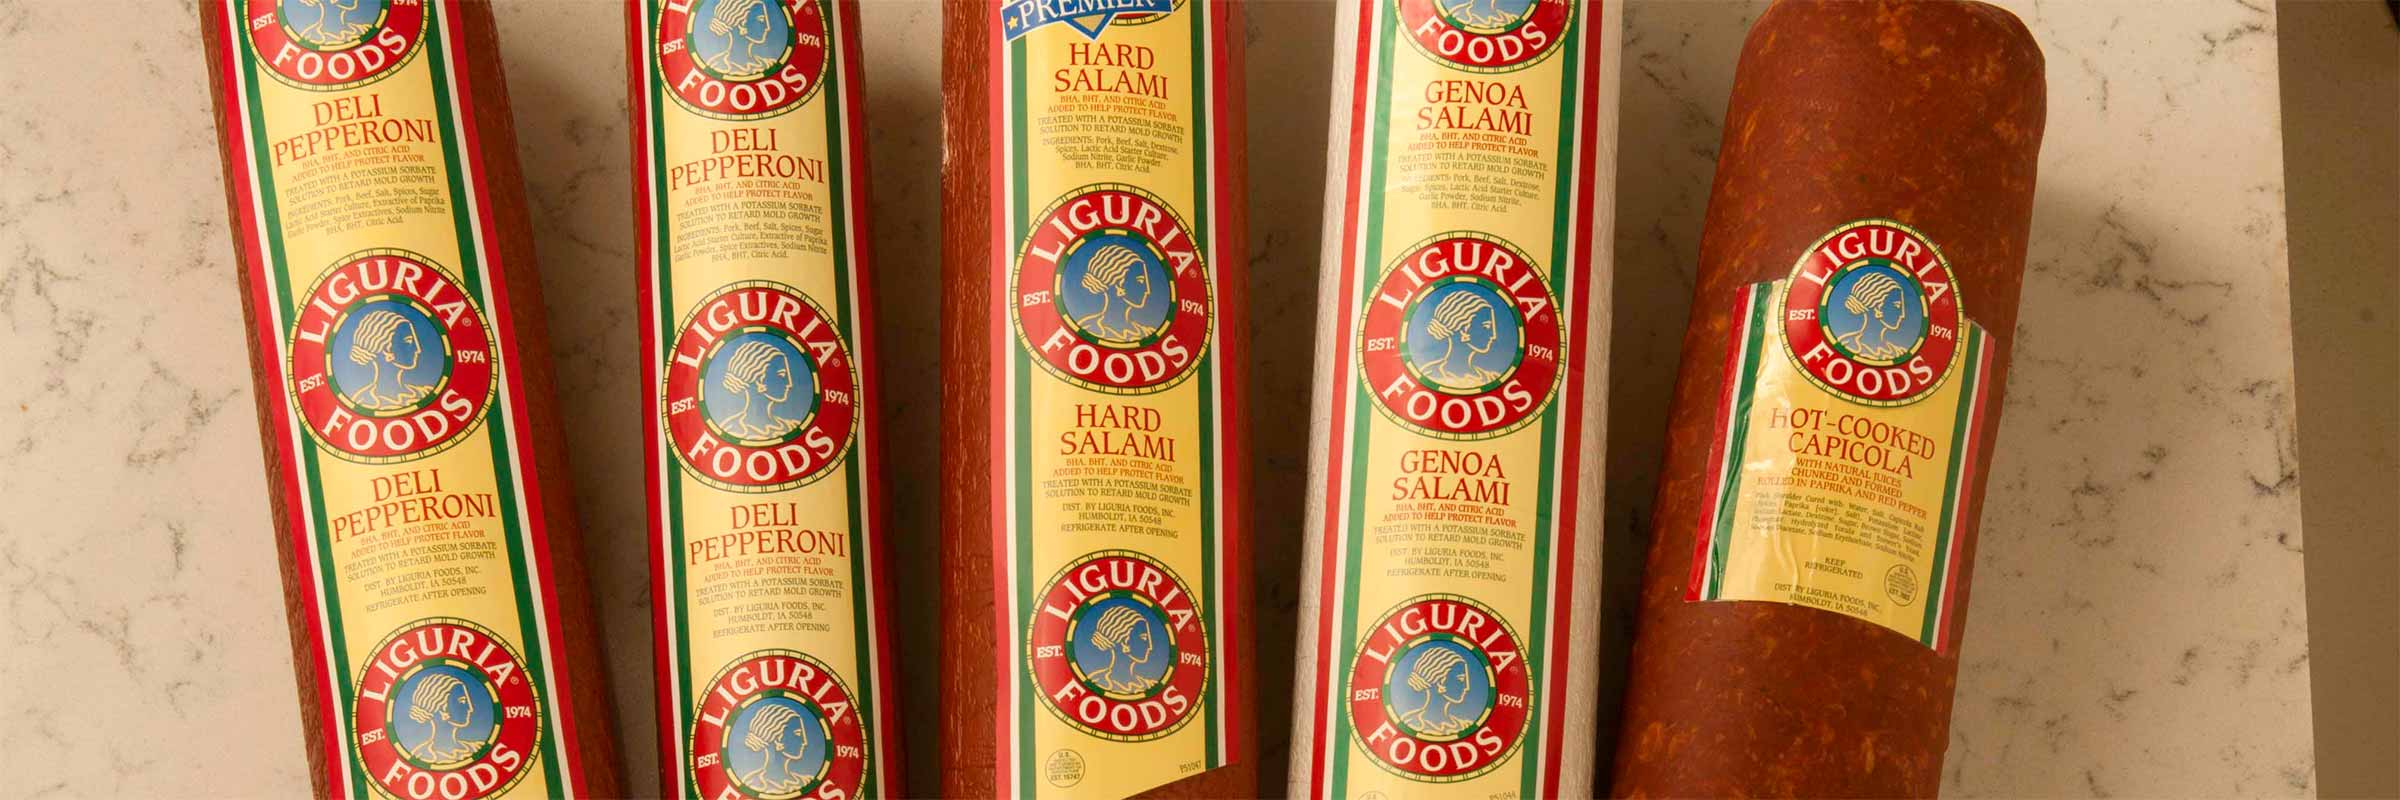 Find a Distributor Near You - Liguria Foods